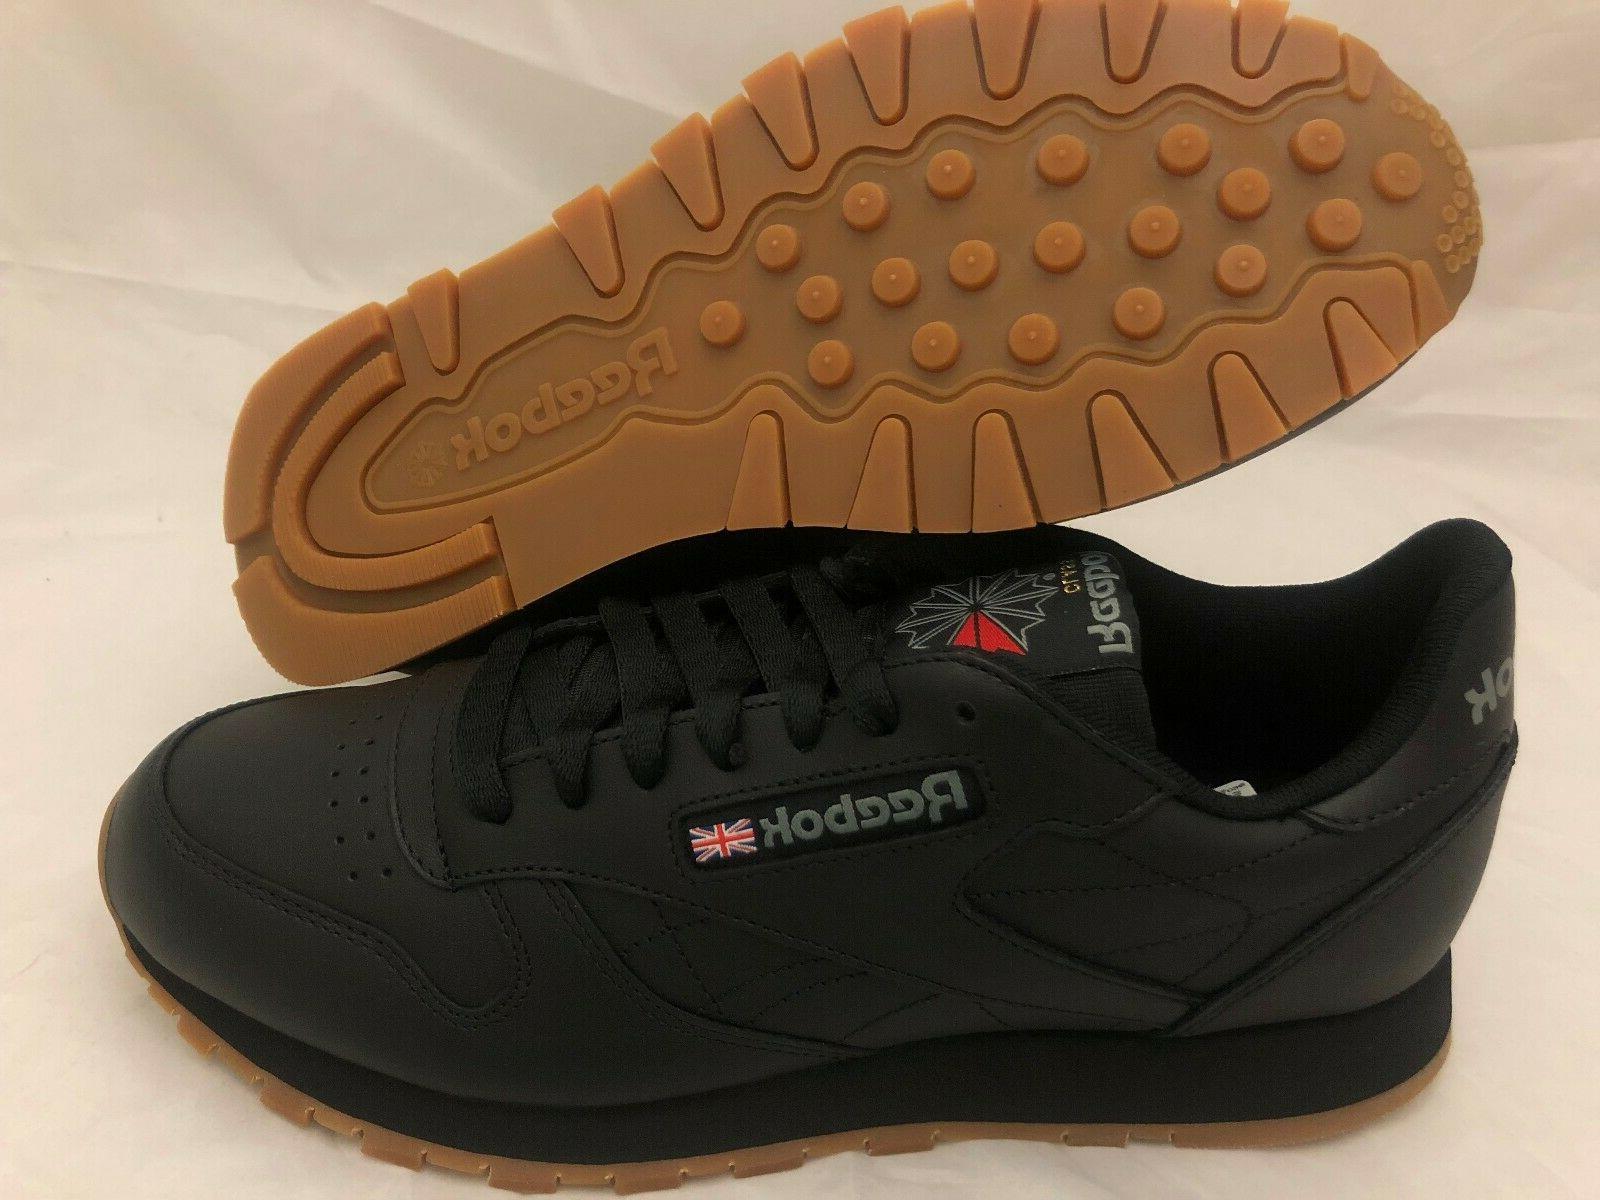 mens classic tennis shoe cl lth style